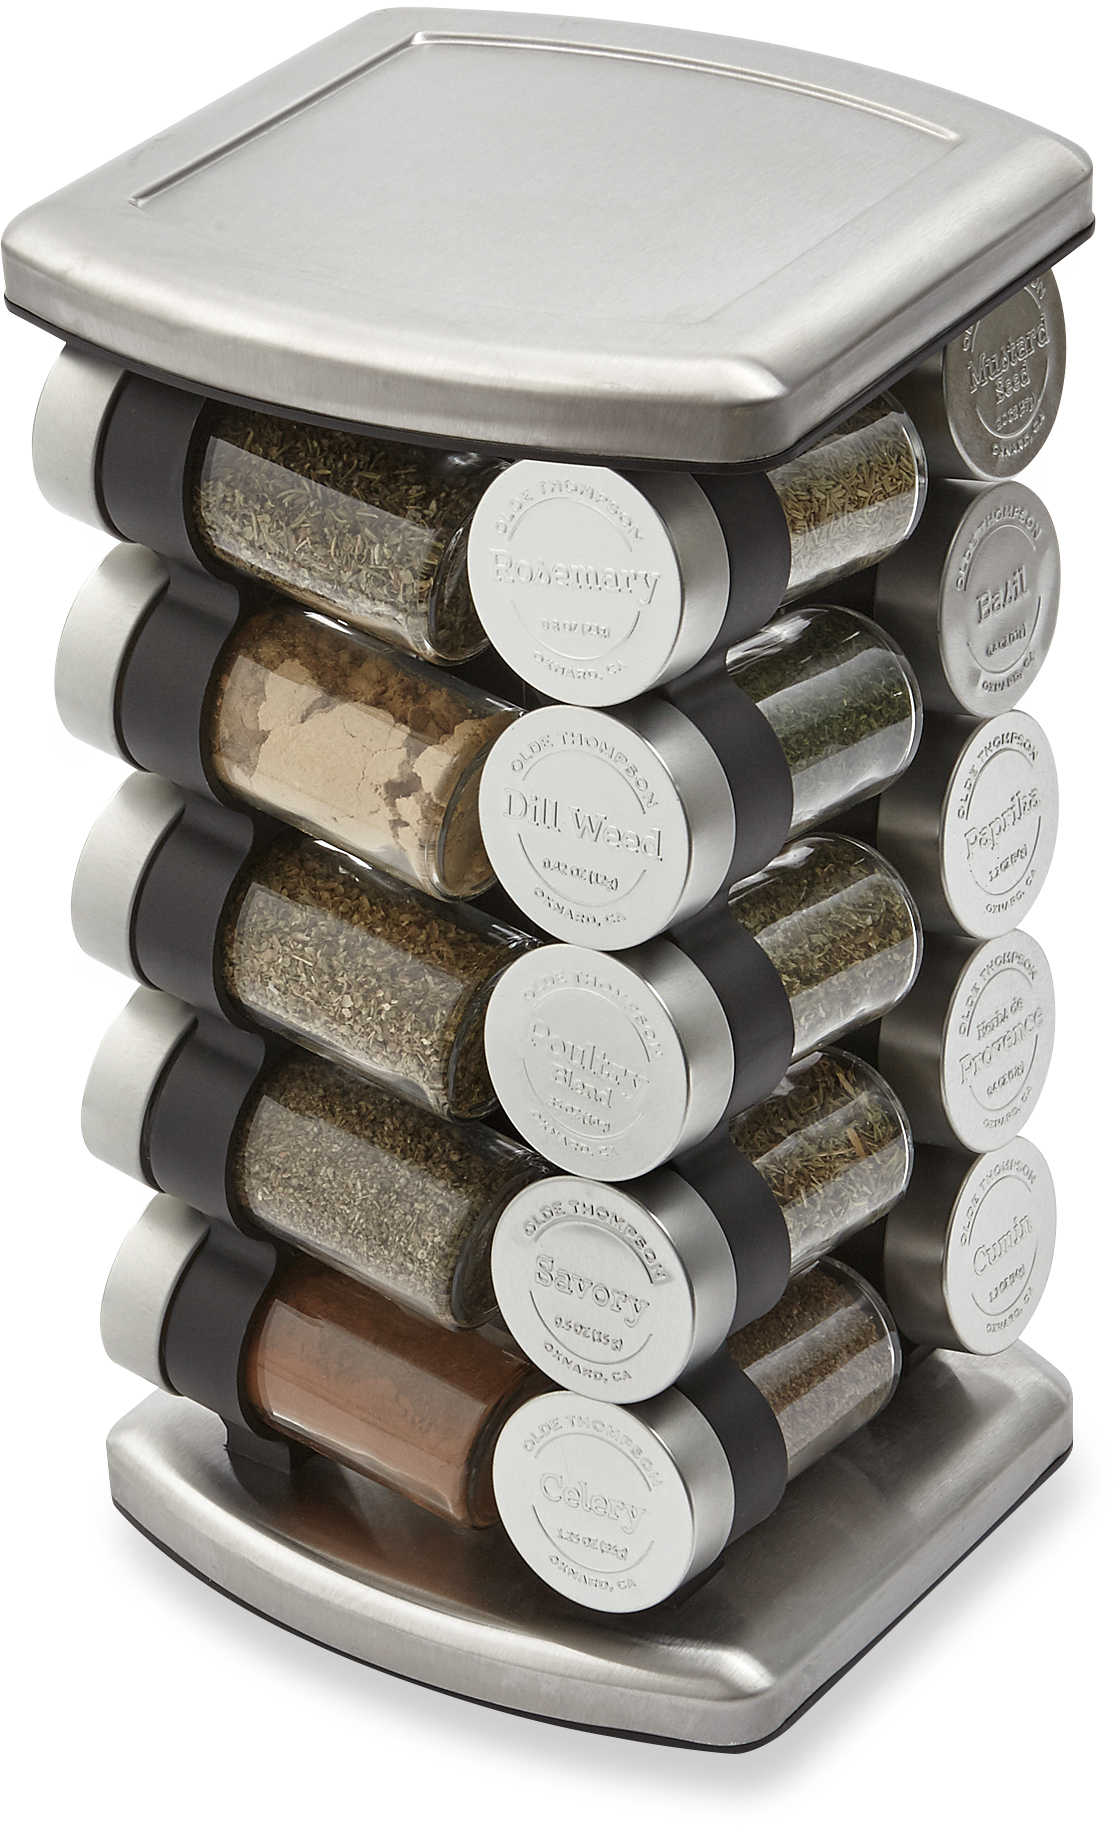 Olde Thompson 20 Jar Embossed Revolving Spice Rack - Bed Bath & Beyond